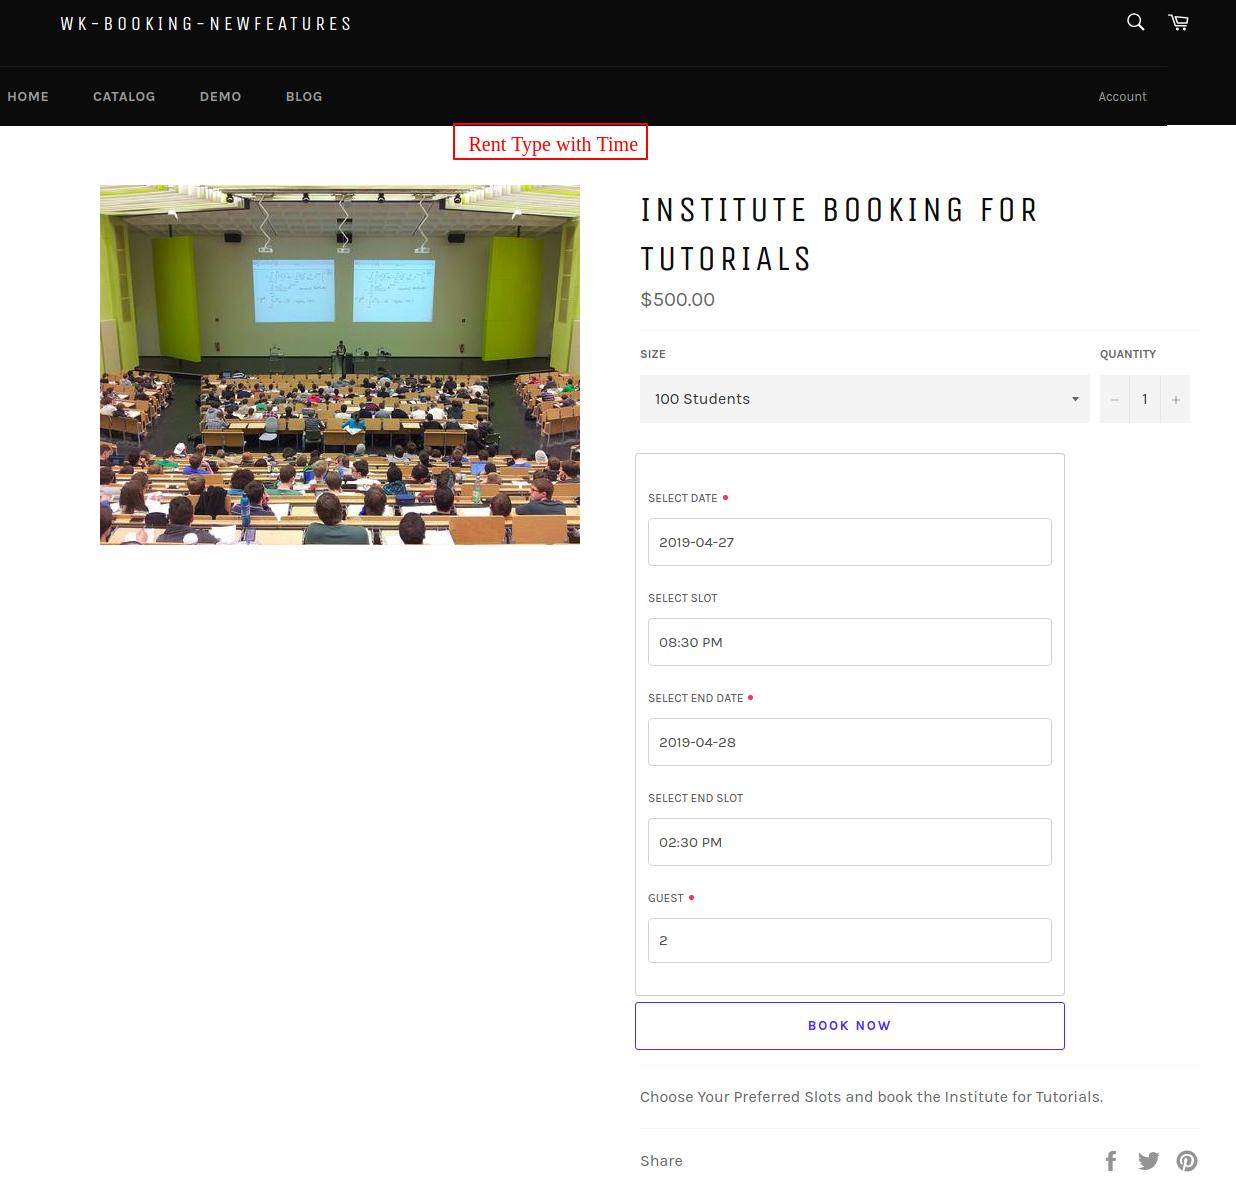 Institute booking for tutorials – wk booking newfeatures